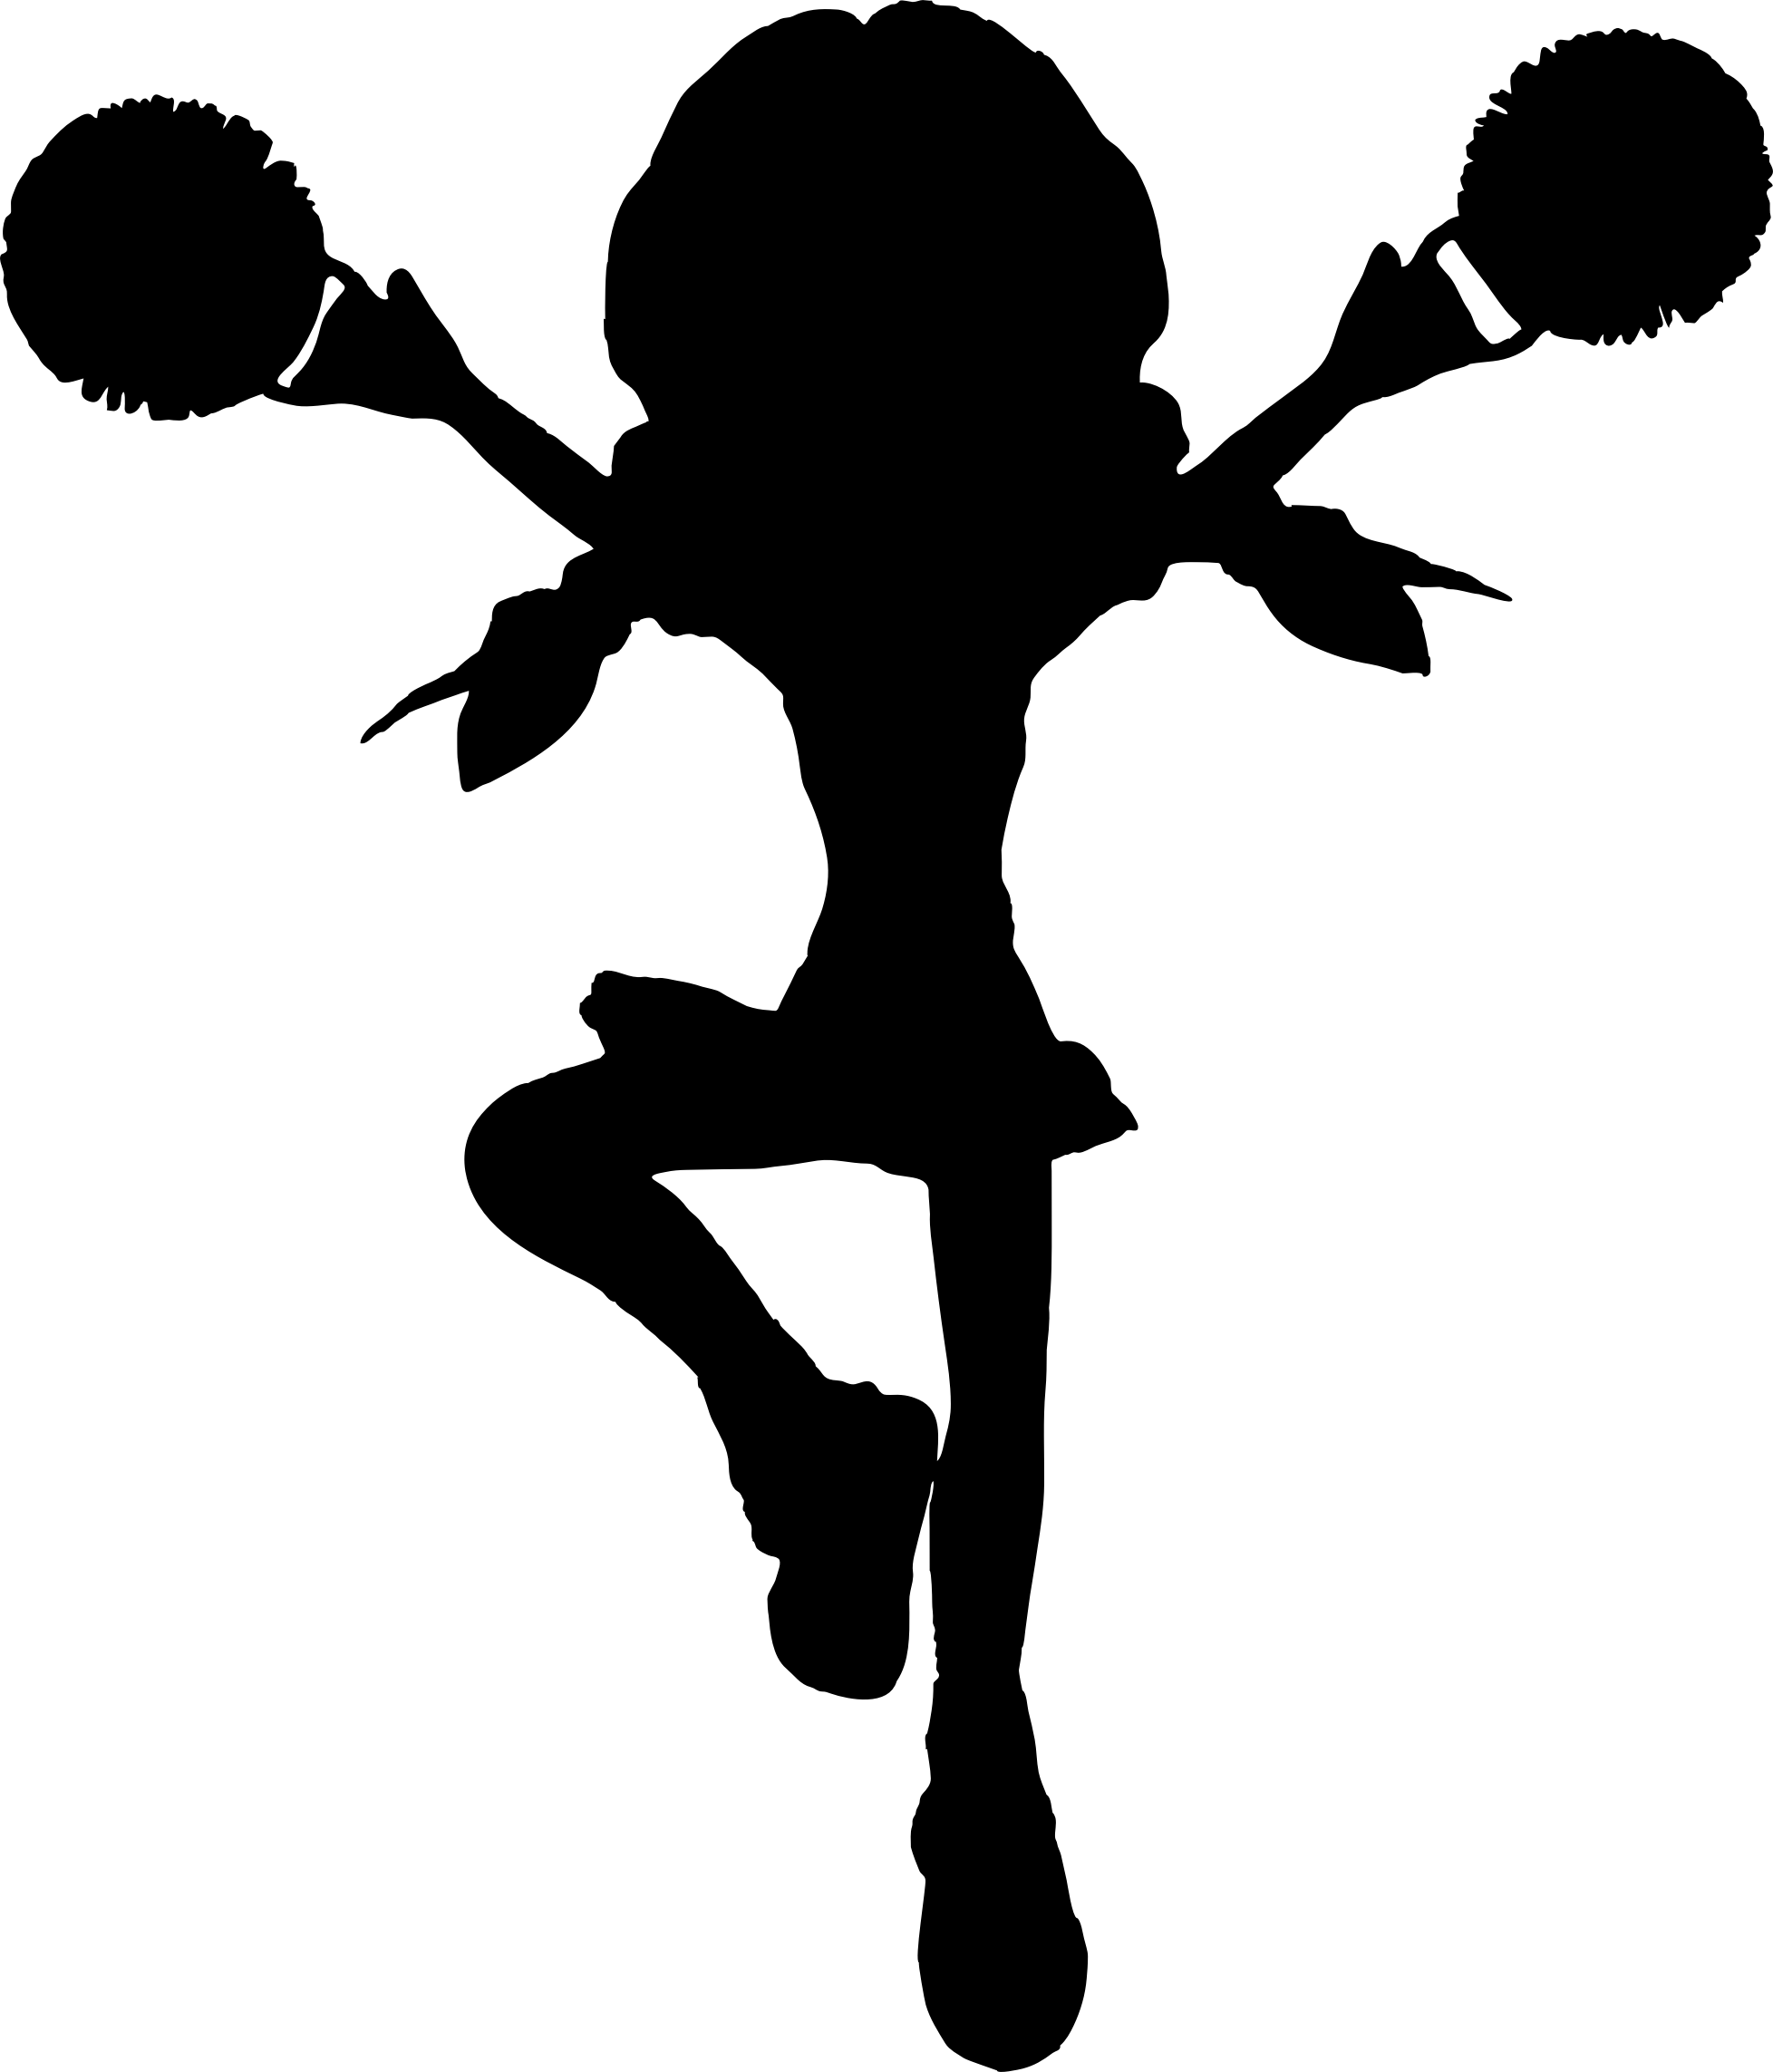 Cheer clipart silhouette. Cartoon cheerleader